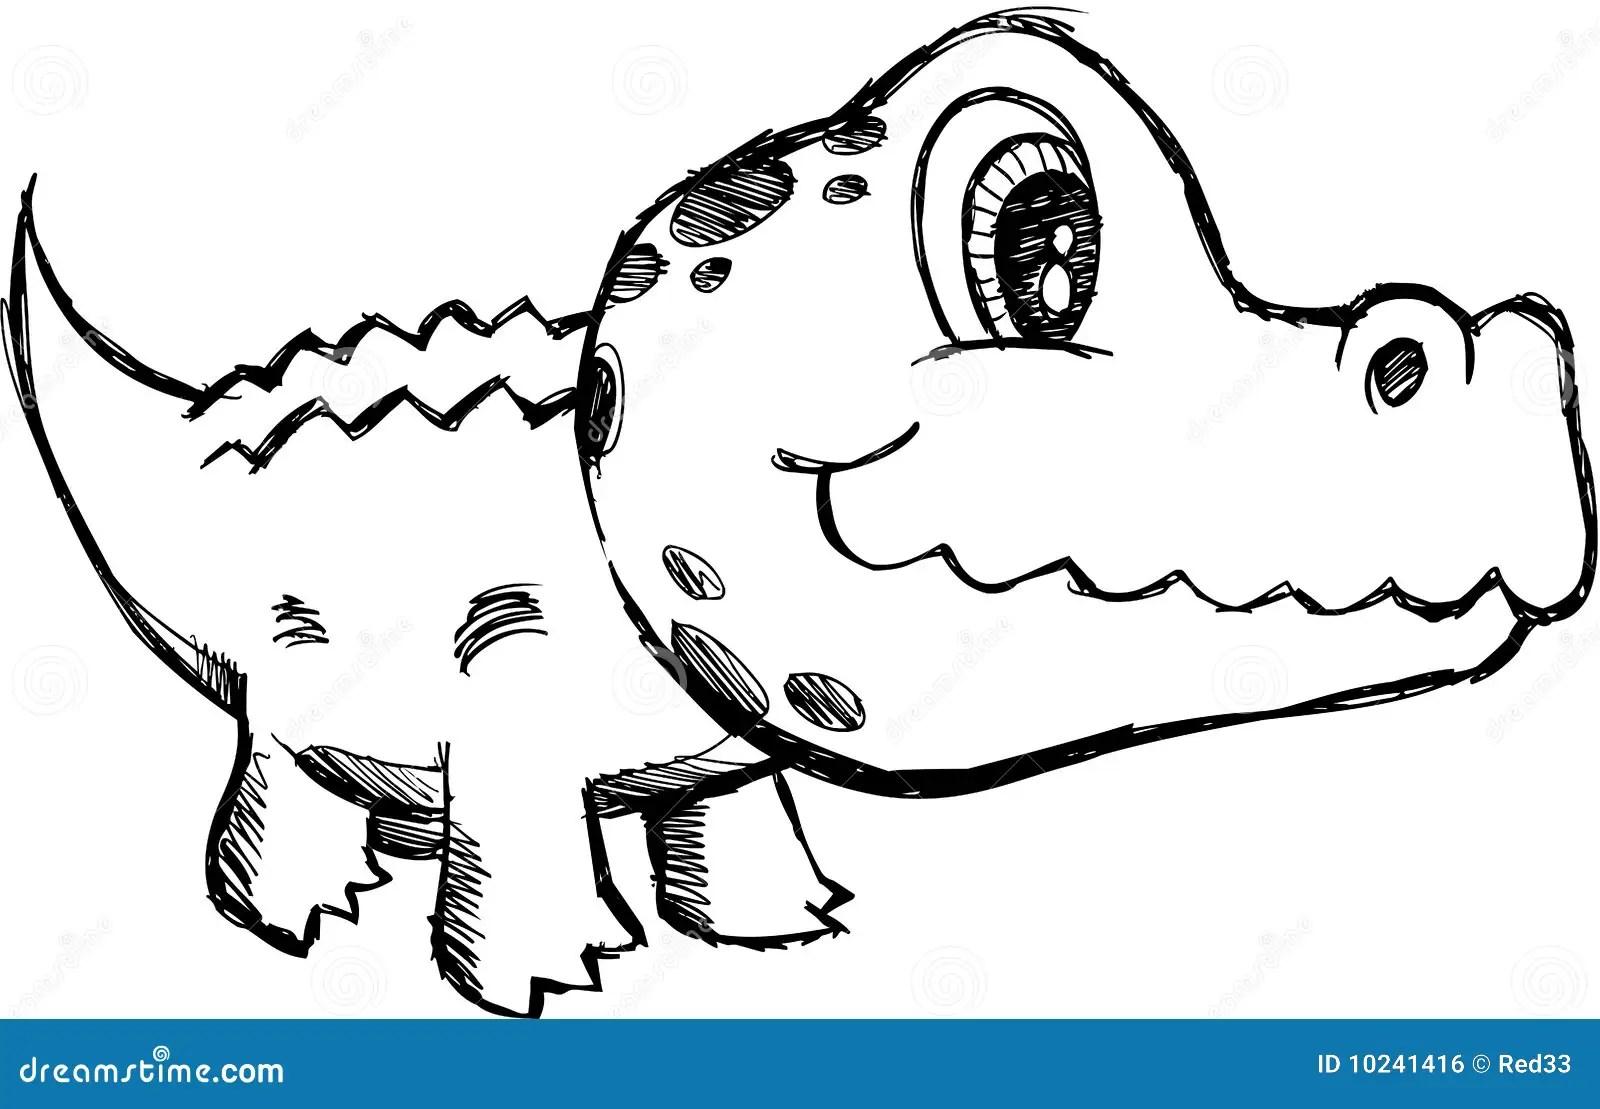 Baby Crocodile Drawing